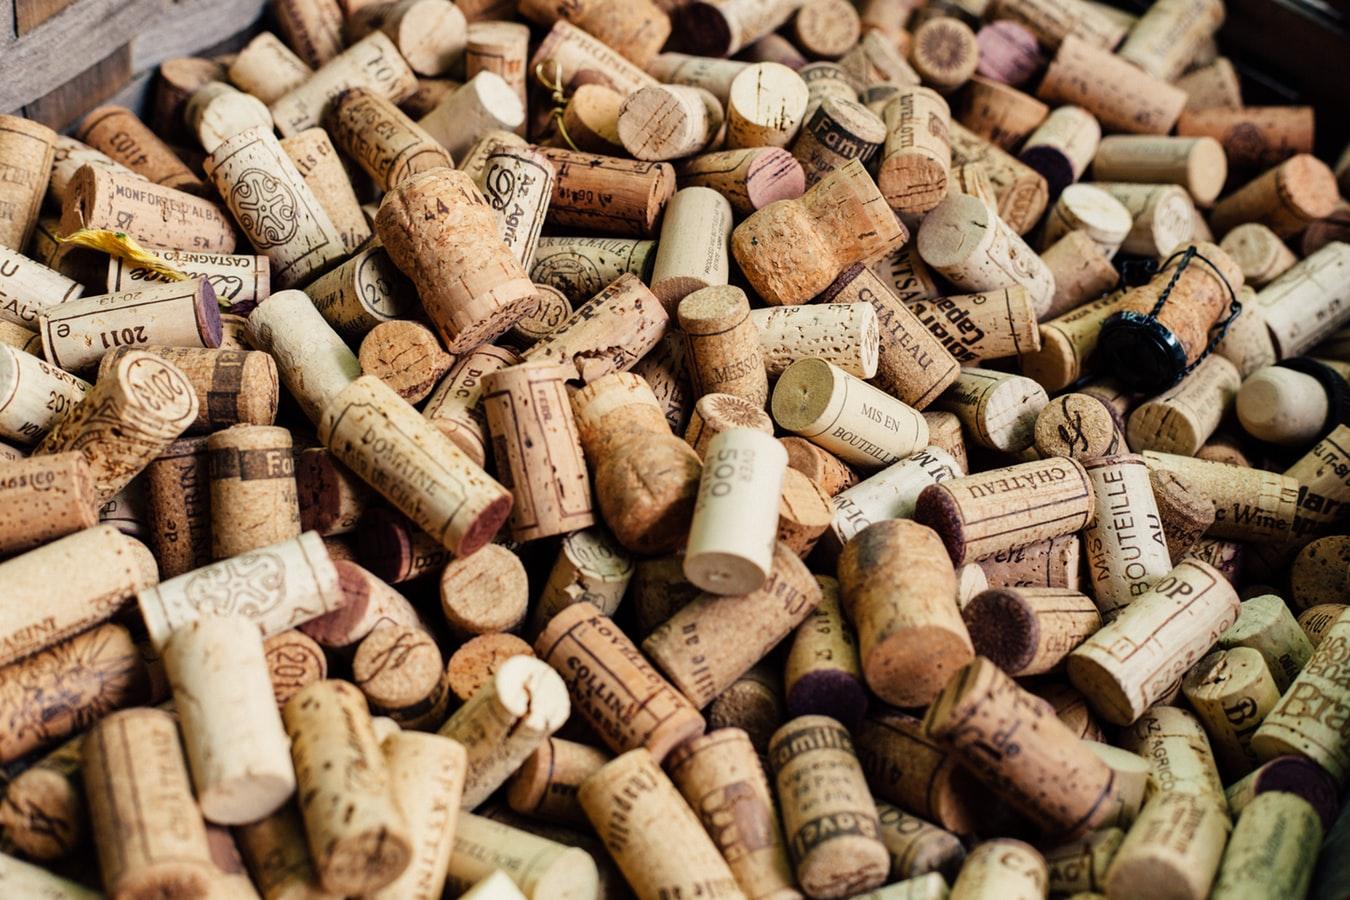 cork, do not compost